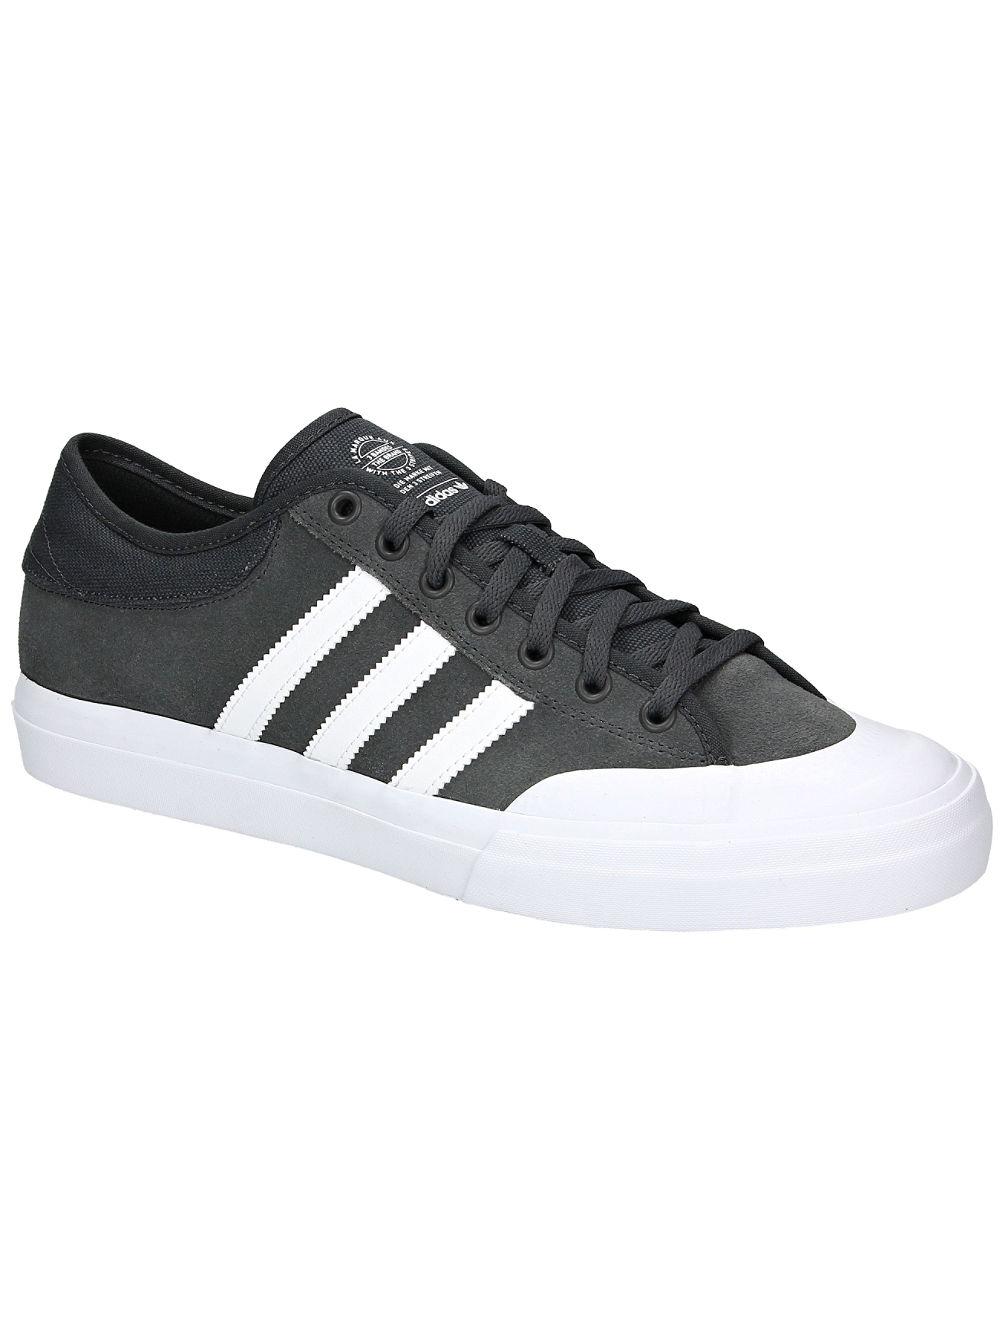 achetez adidas skateboarding matchcourt adv chaussures de skate en ligne sur blue. Black Bedroom Furniture Sets. Home Design Ideas